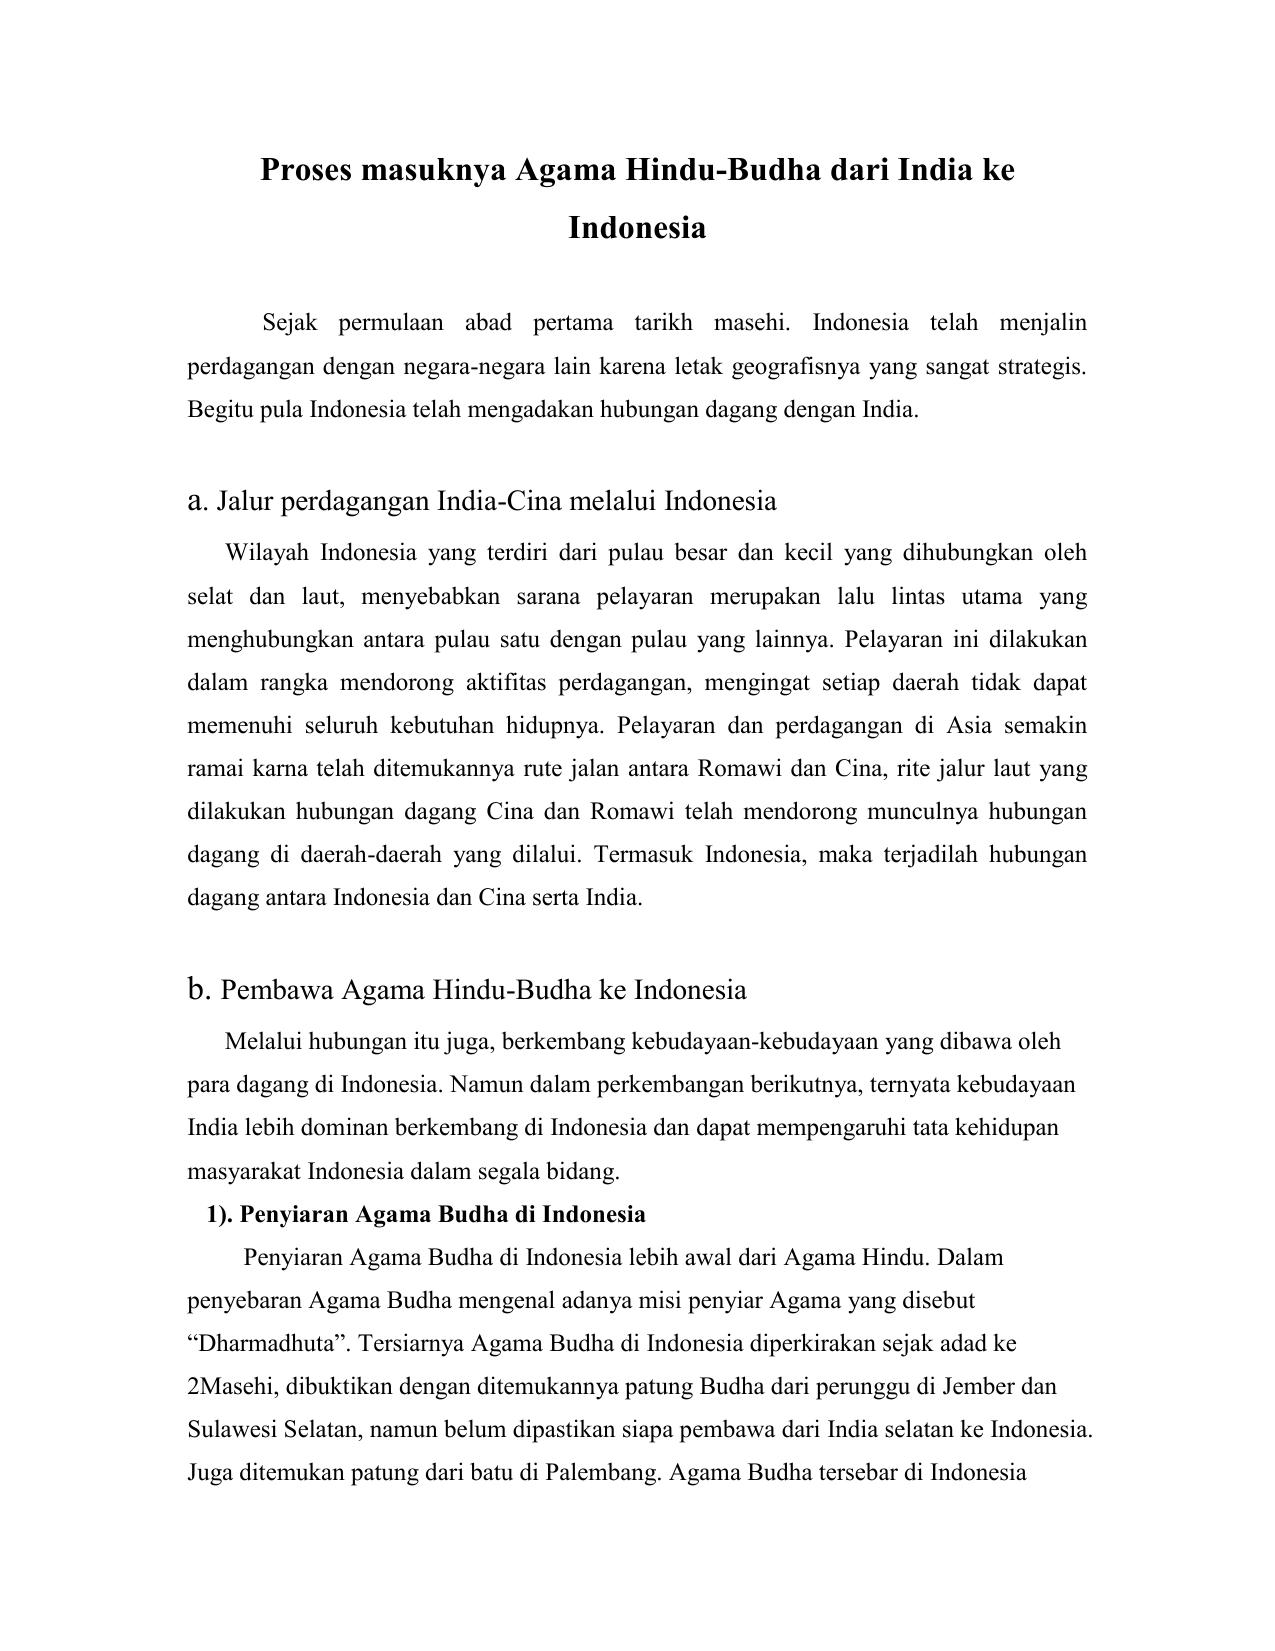 Proses Masuknya Agama Hindu Budha Dari India